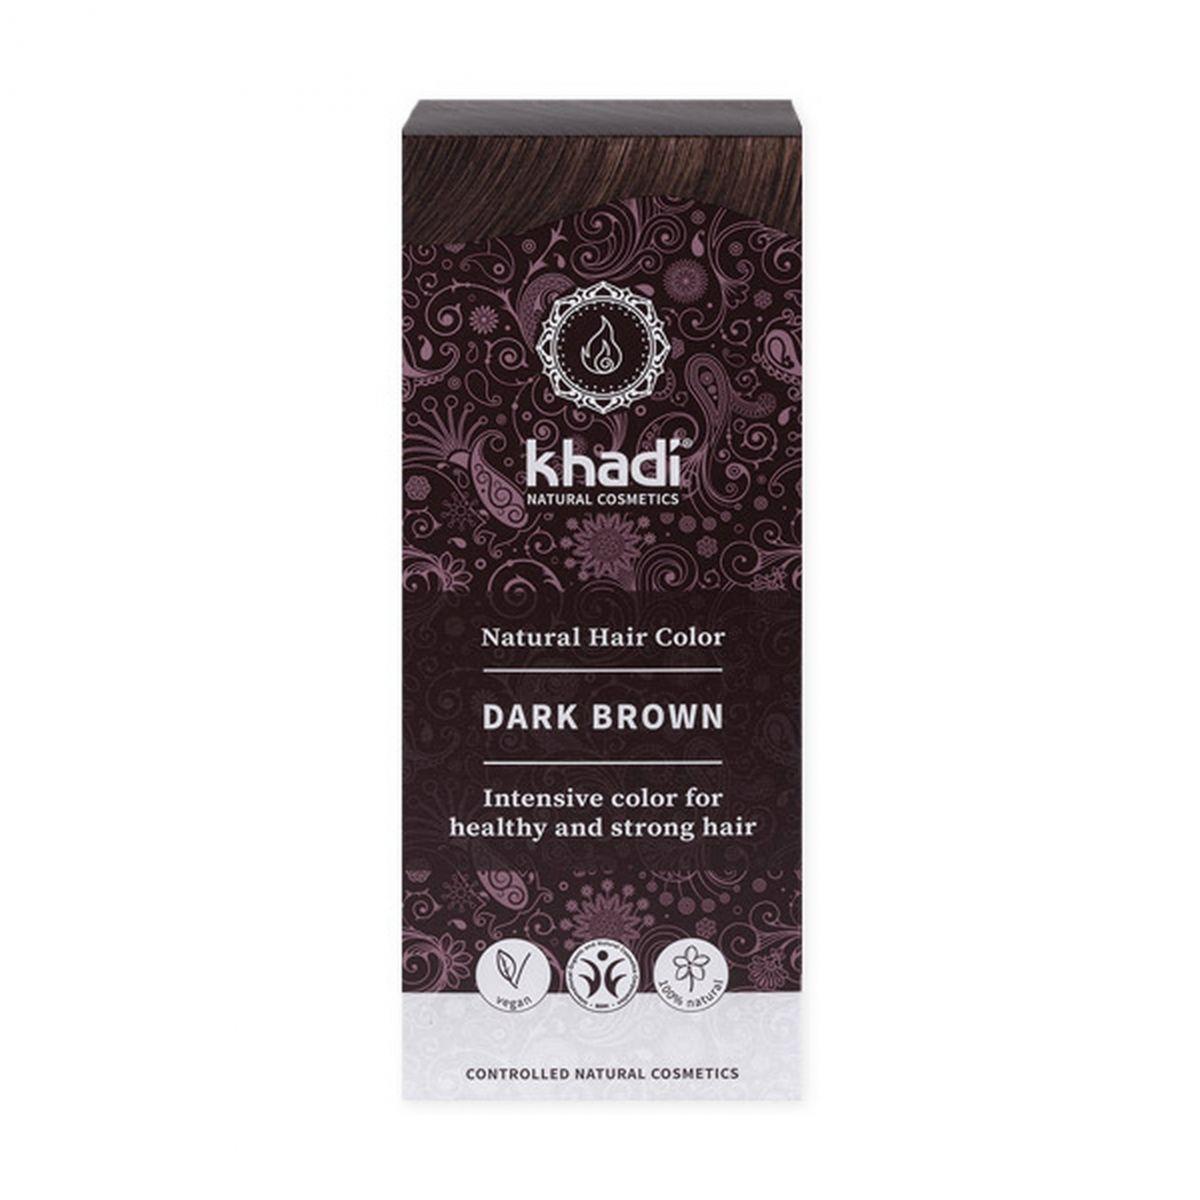 Naturalna indyjska henna - ciemny brąz - 100g - Khadi